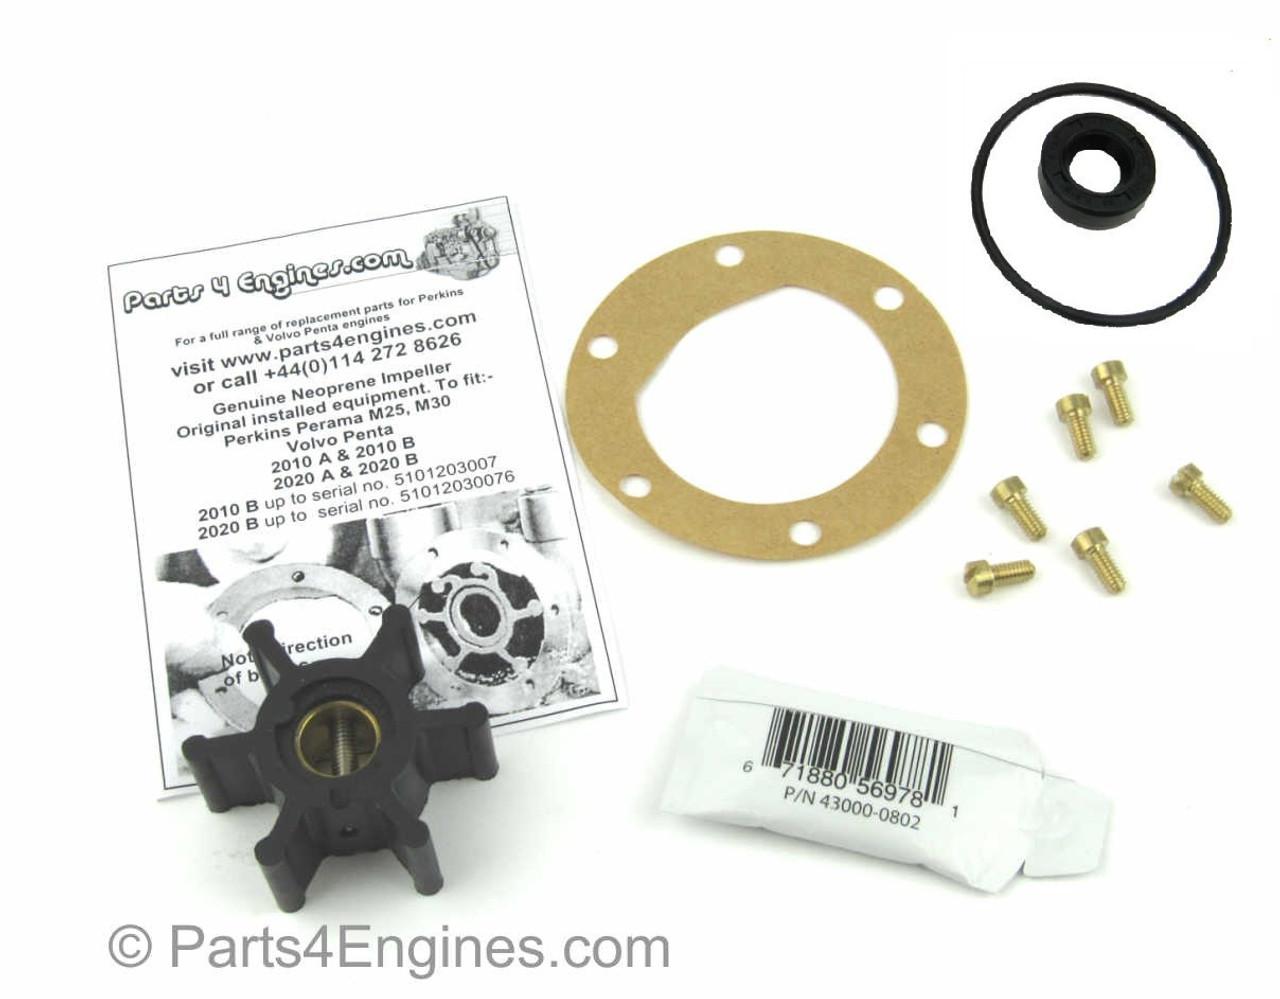 Perkins Perama M25 raw water pump service kit - parts4engines.com